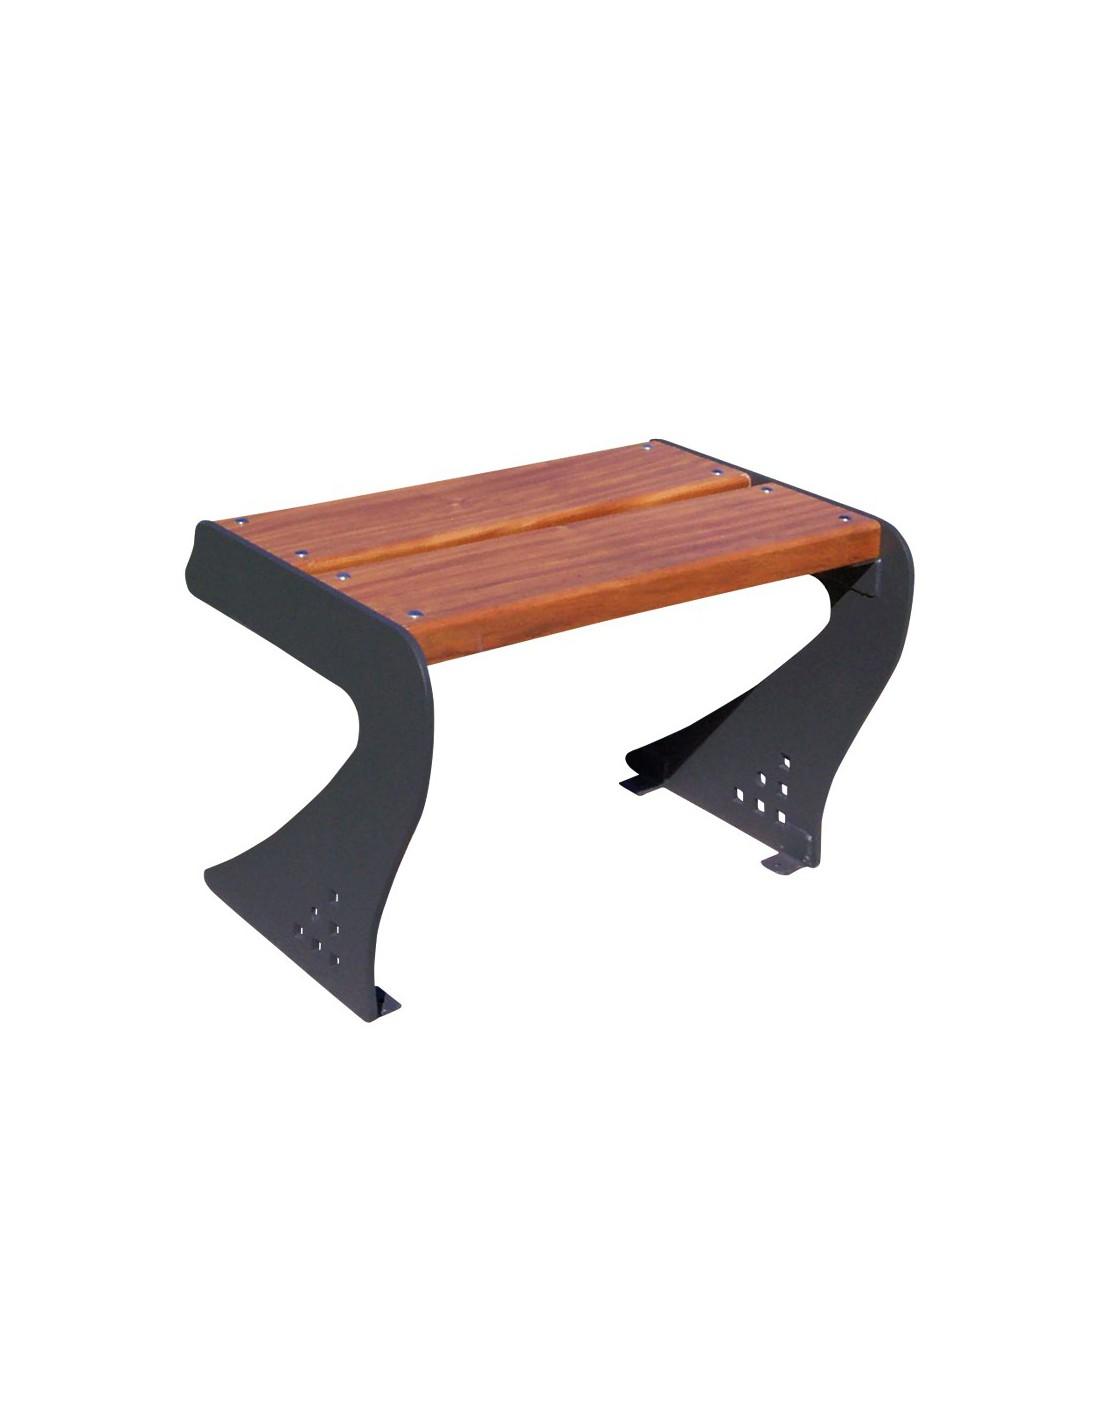 chaise l baro sans dossier dessin e par visina villar. Black Bedroom Furniture Sets. Home Design Ideas